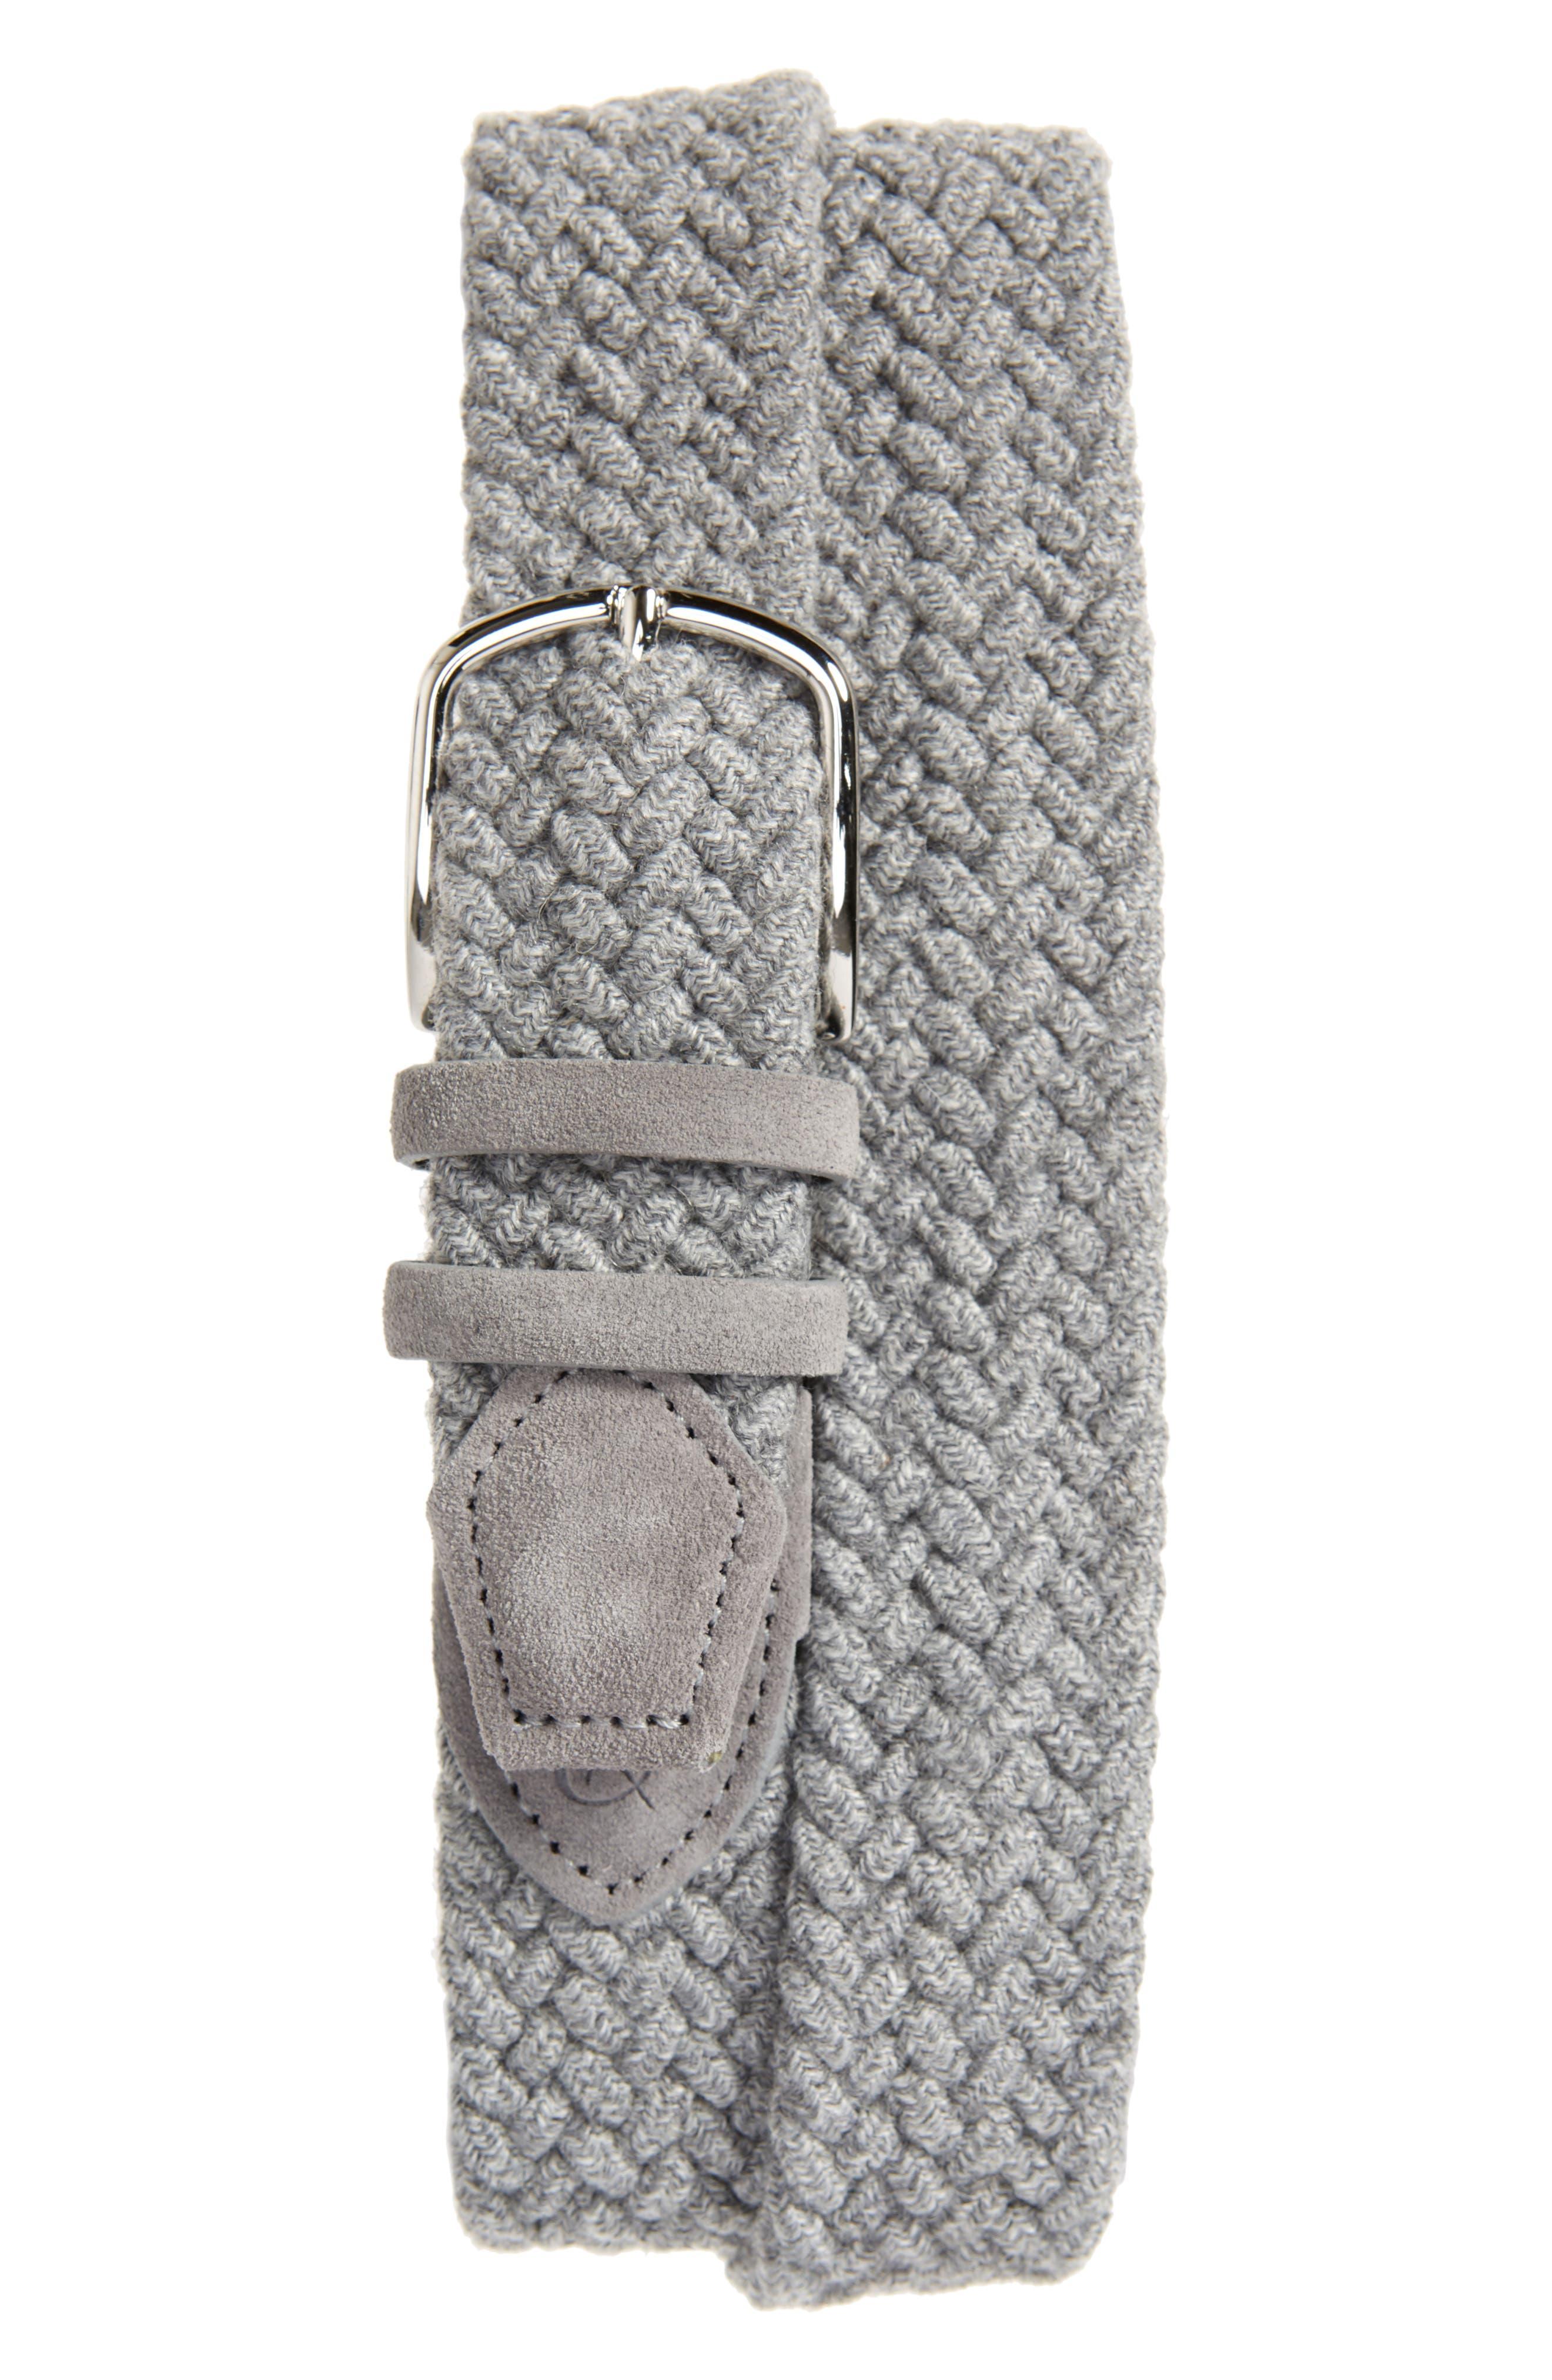 Canali Women's Canali Woven Leather & Wool Blend Belt, Size 32 - Grey